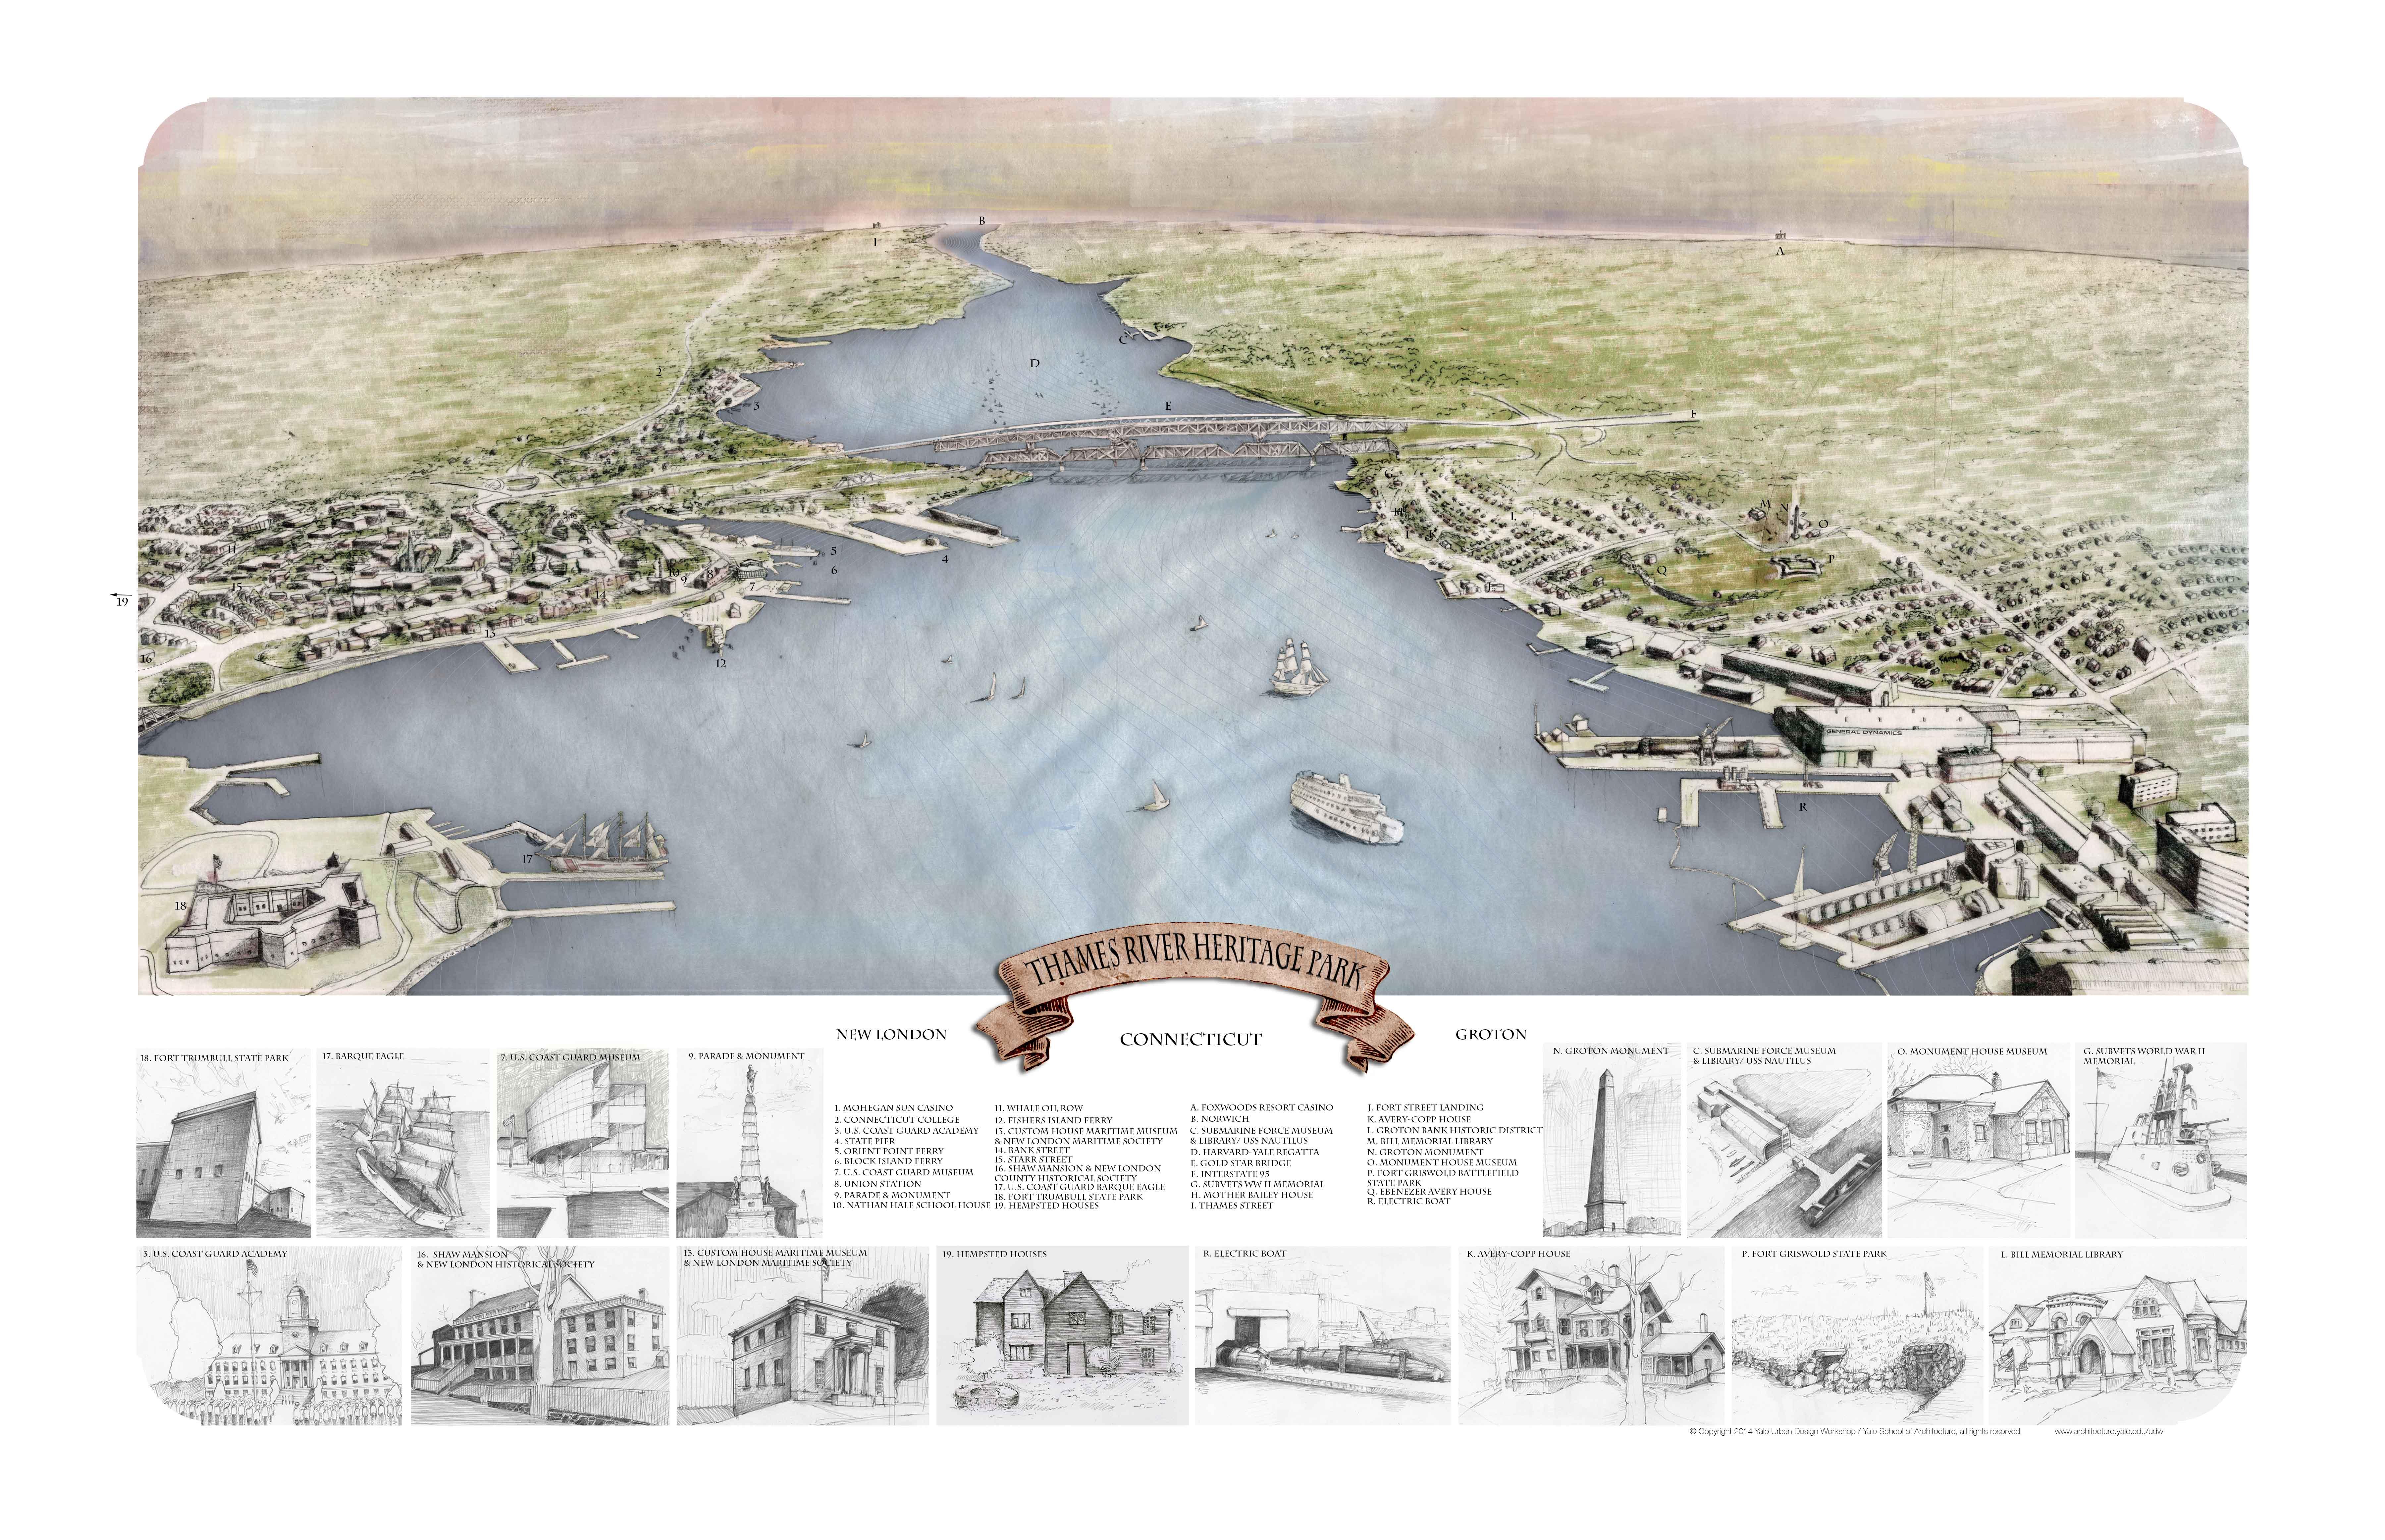 Thames Heritage Park Birdseye-sm - new